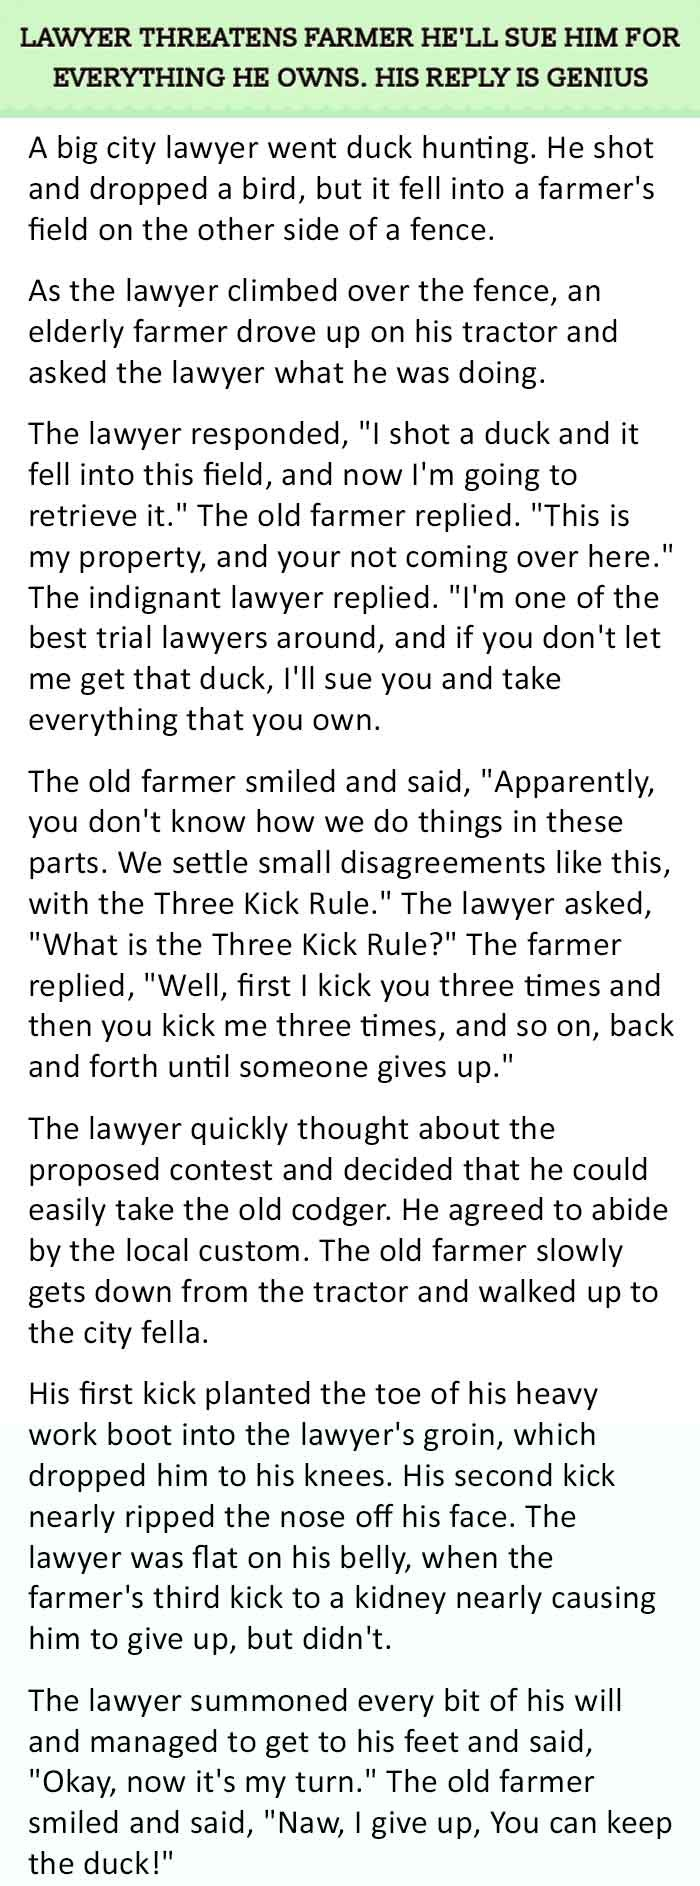 feb14 lawyer post